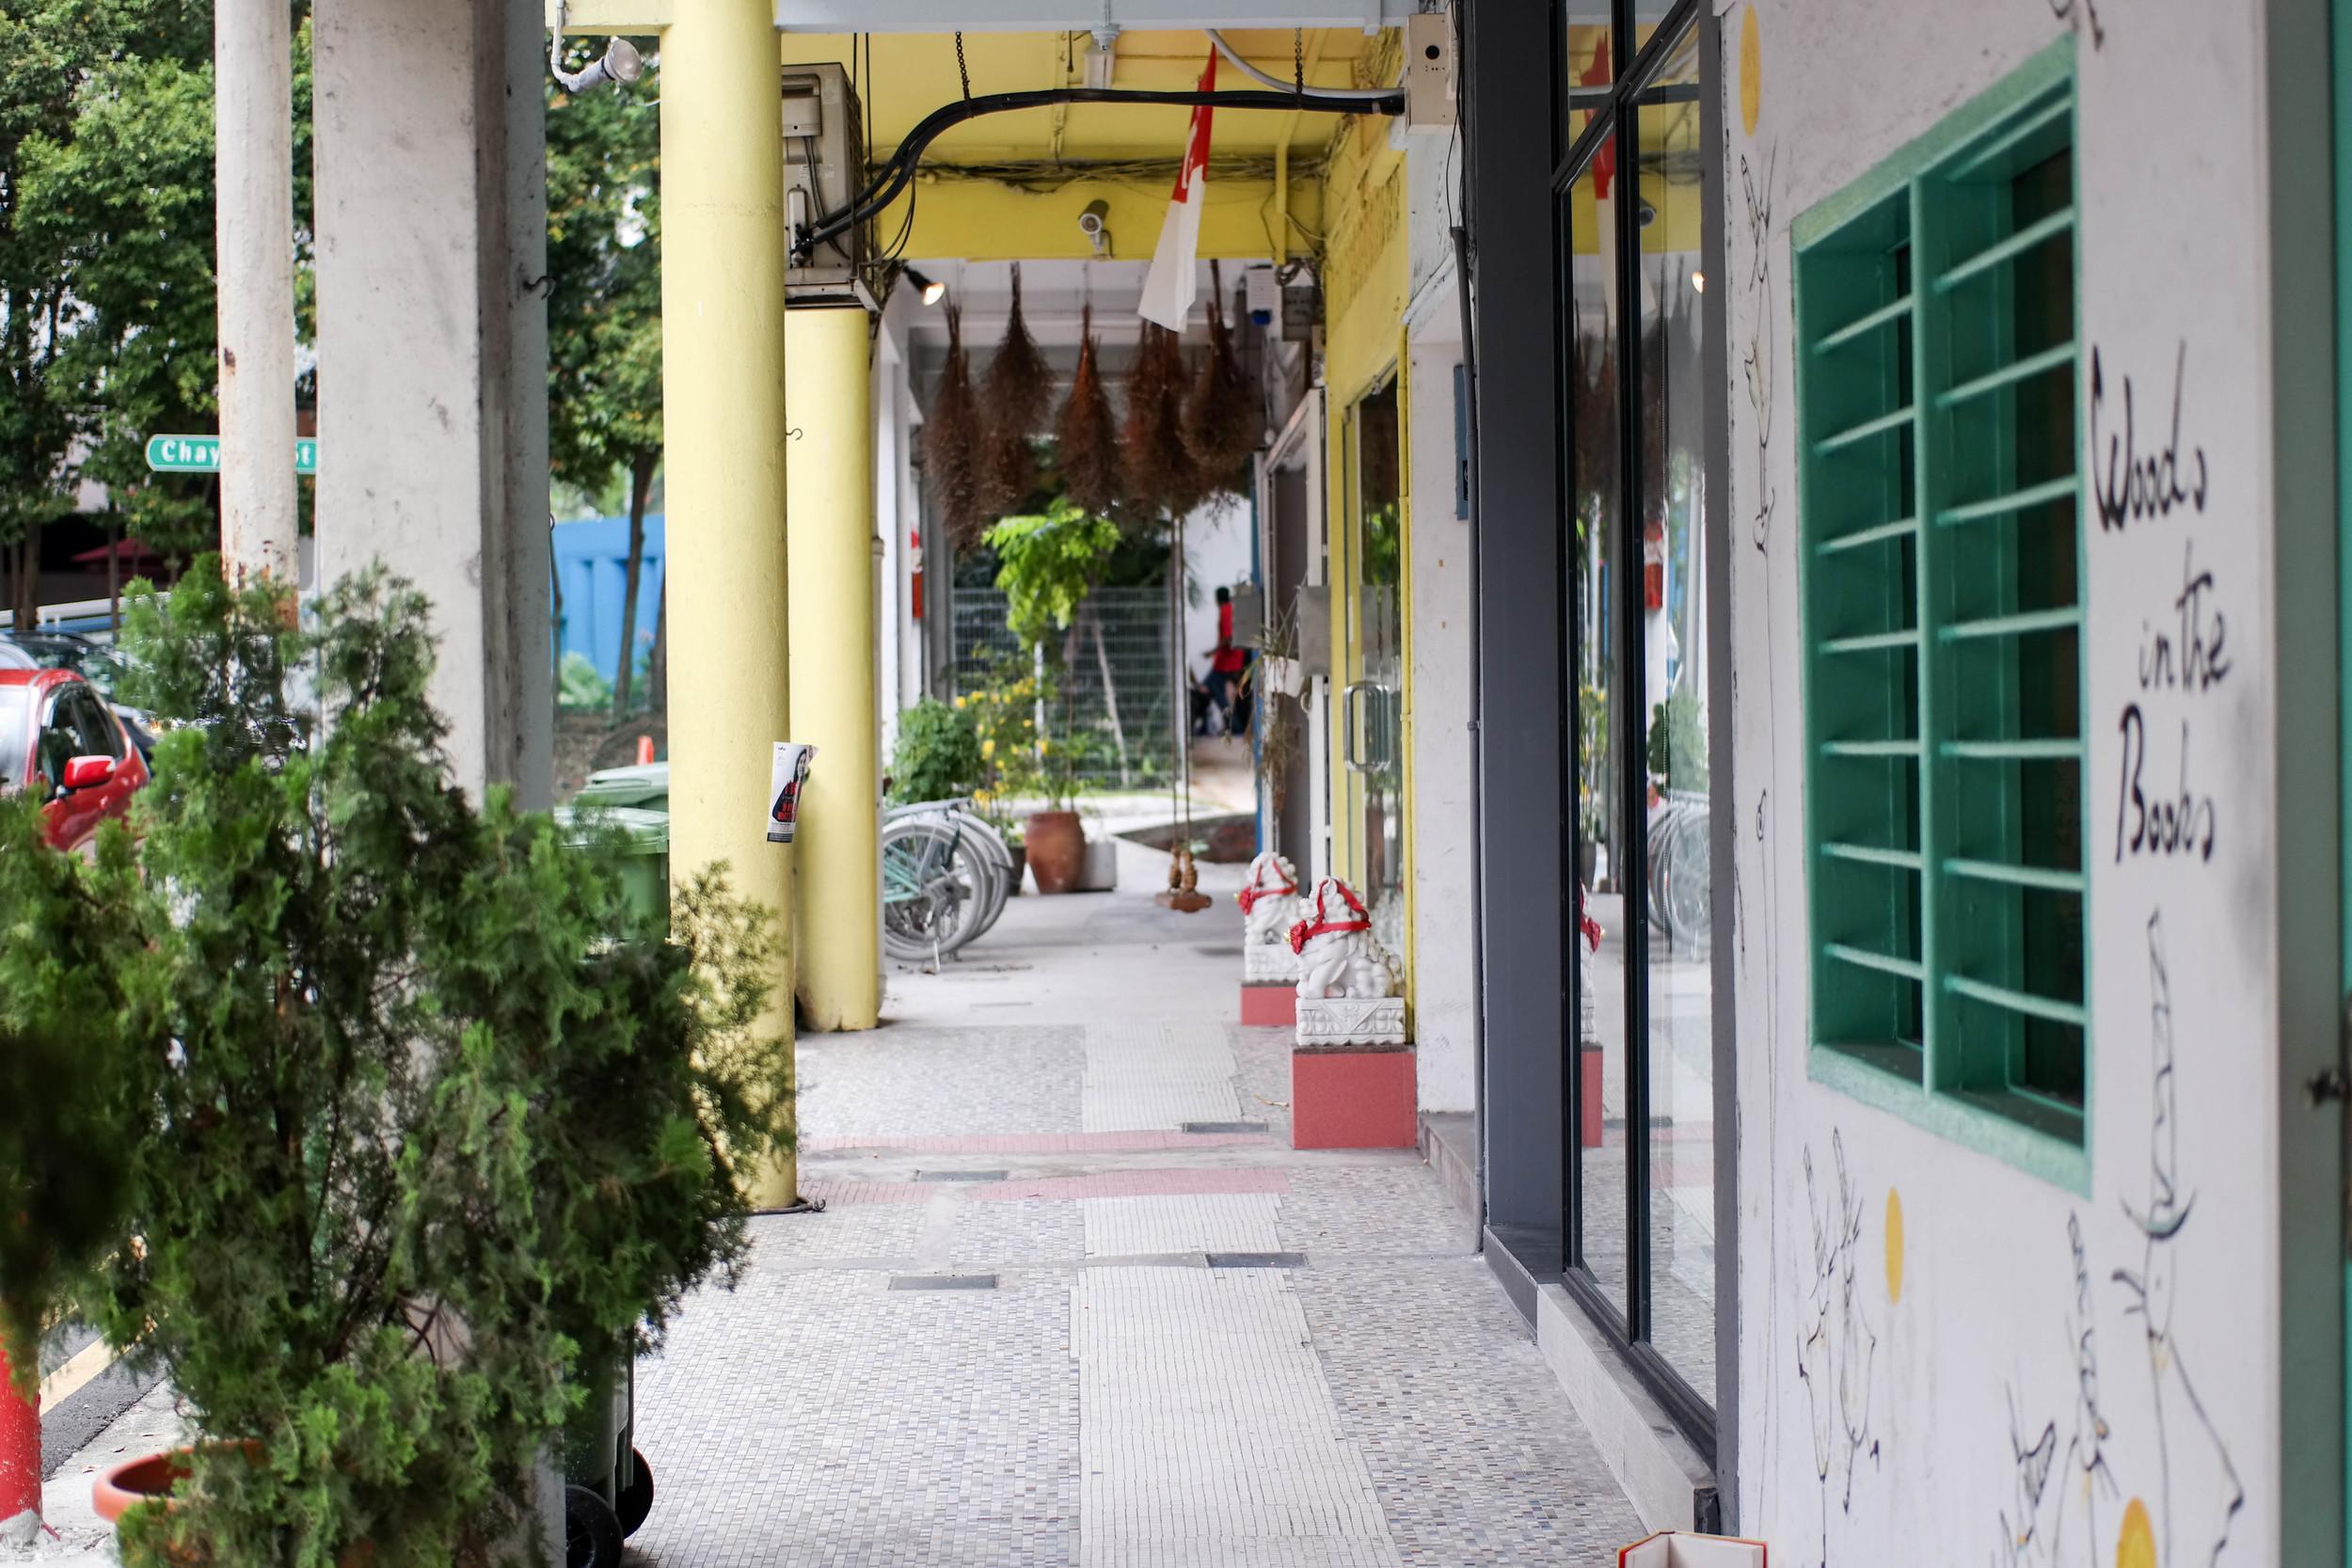 Tiong Bahru Neighborhood